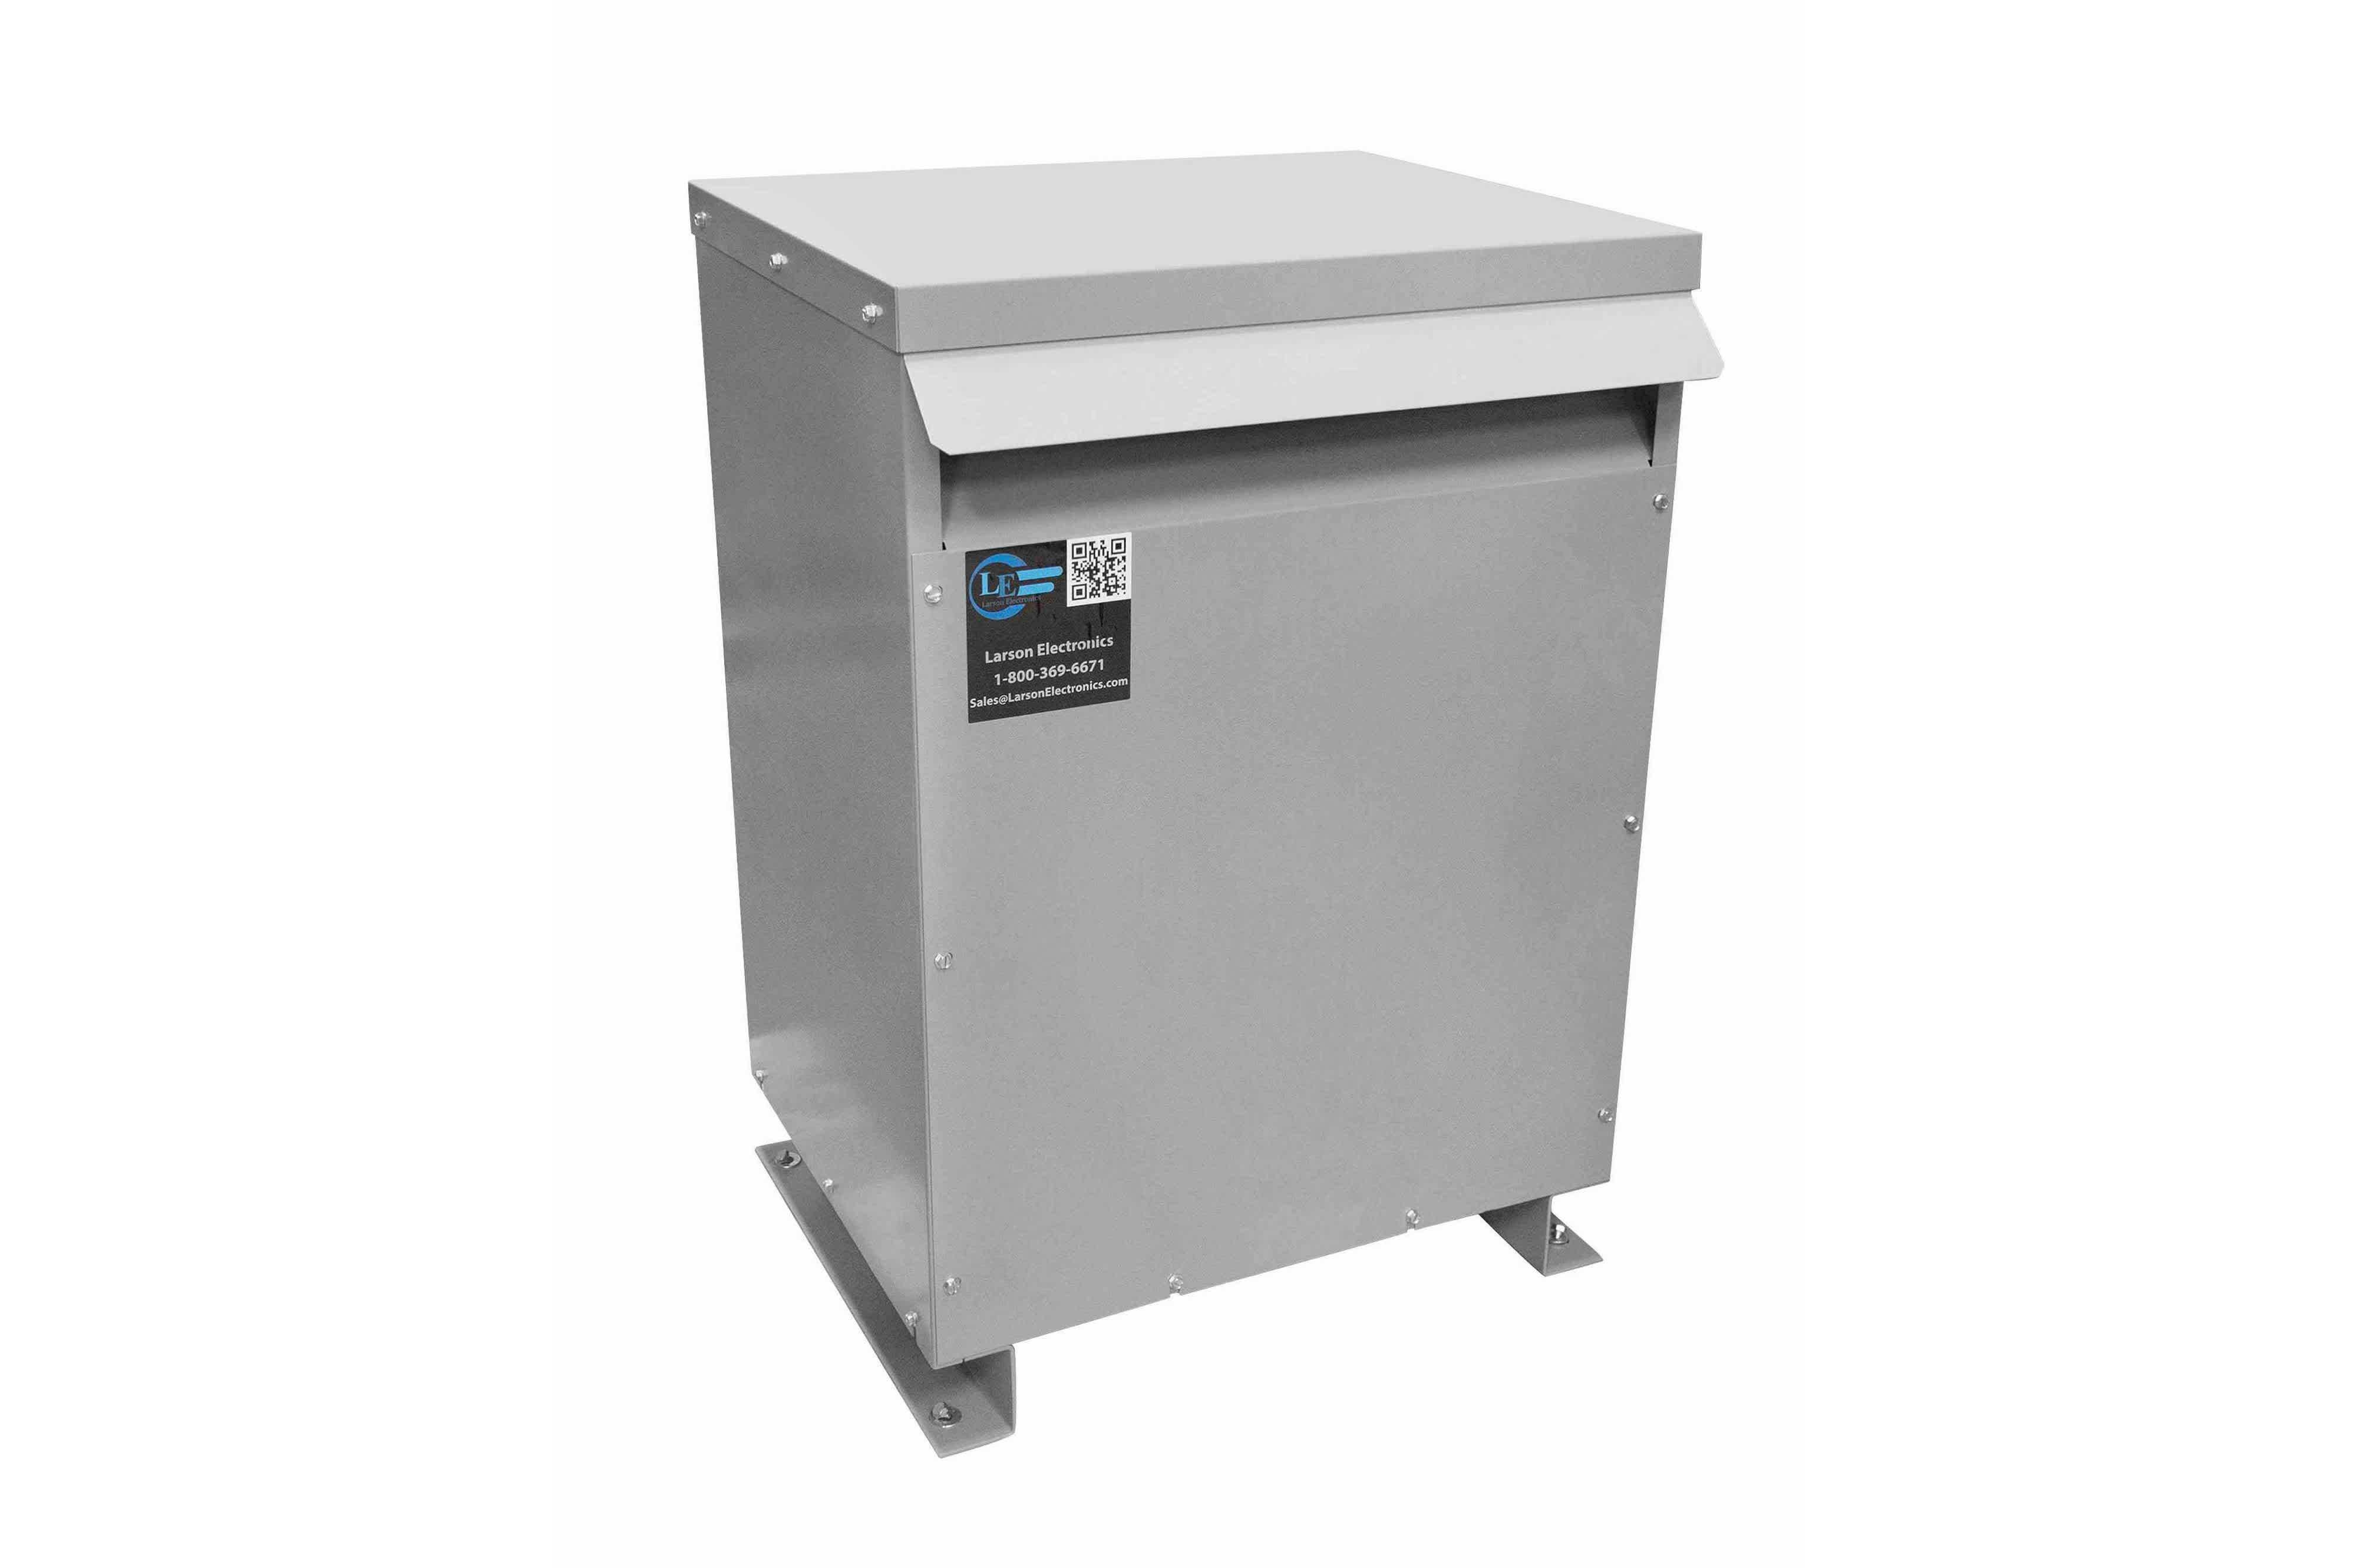 36 kVA 3PH Isolation Transformer, 400V Wye Primary, 208Y/120 Wye-N Secondary, N3R, Ventilated, 60 Hz